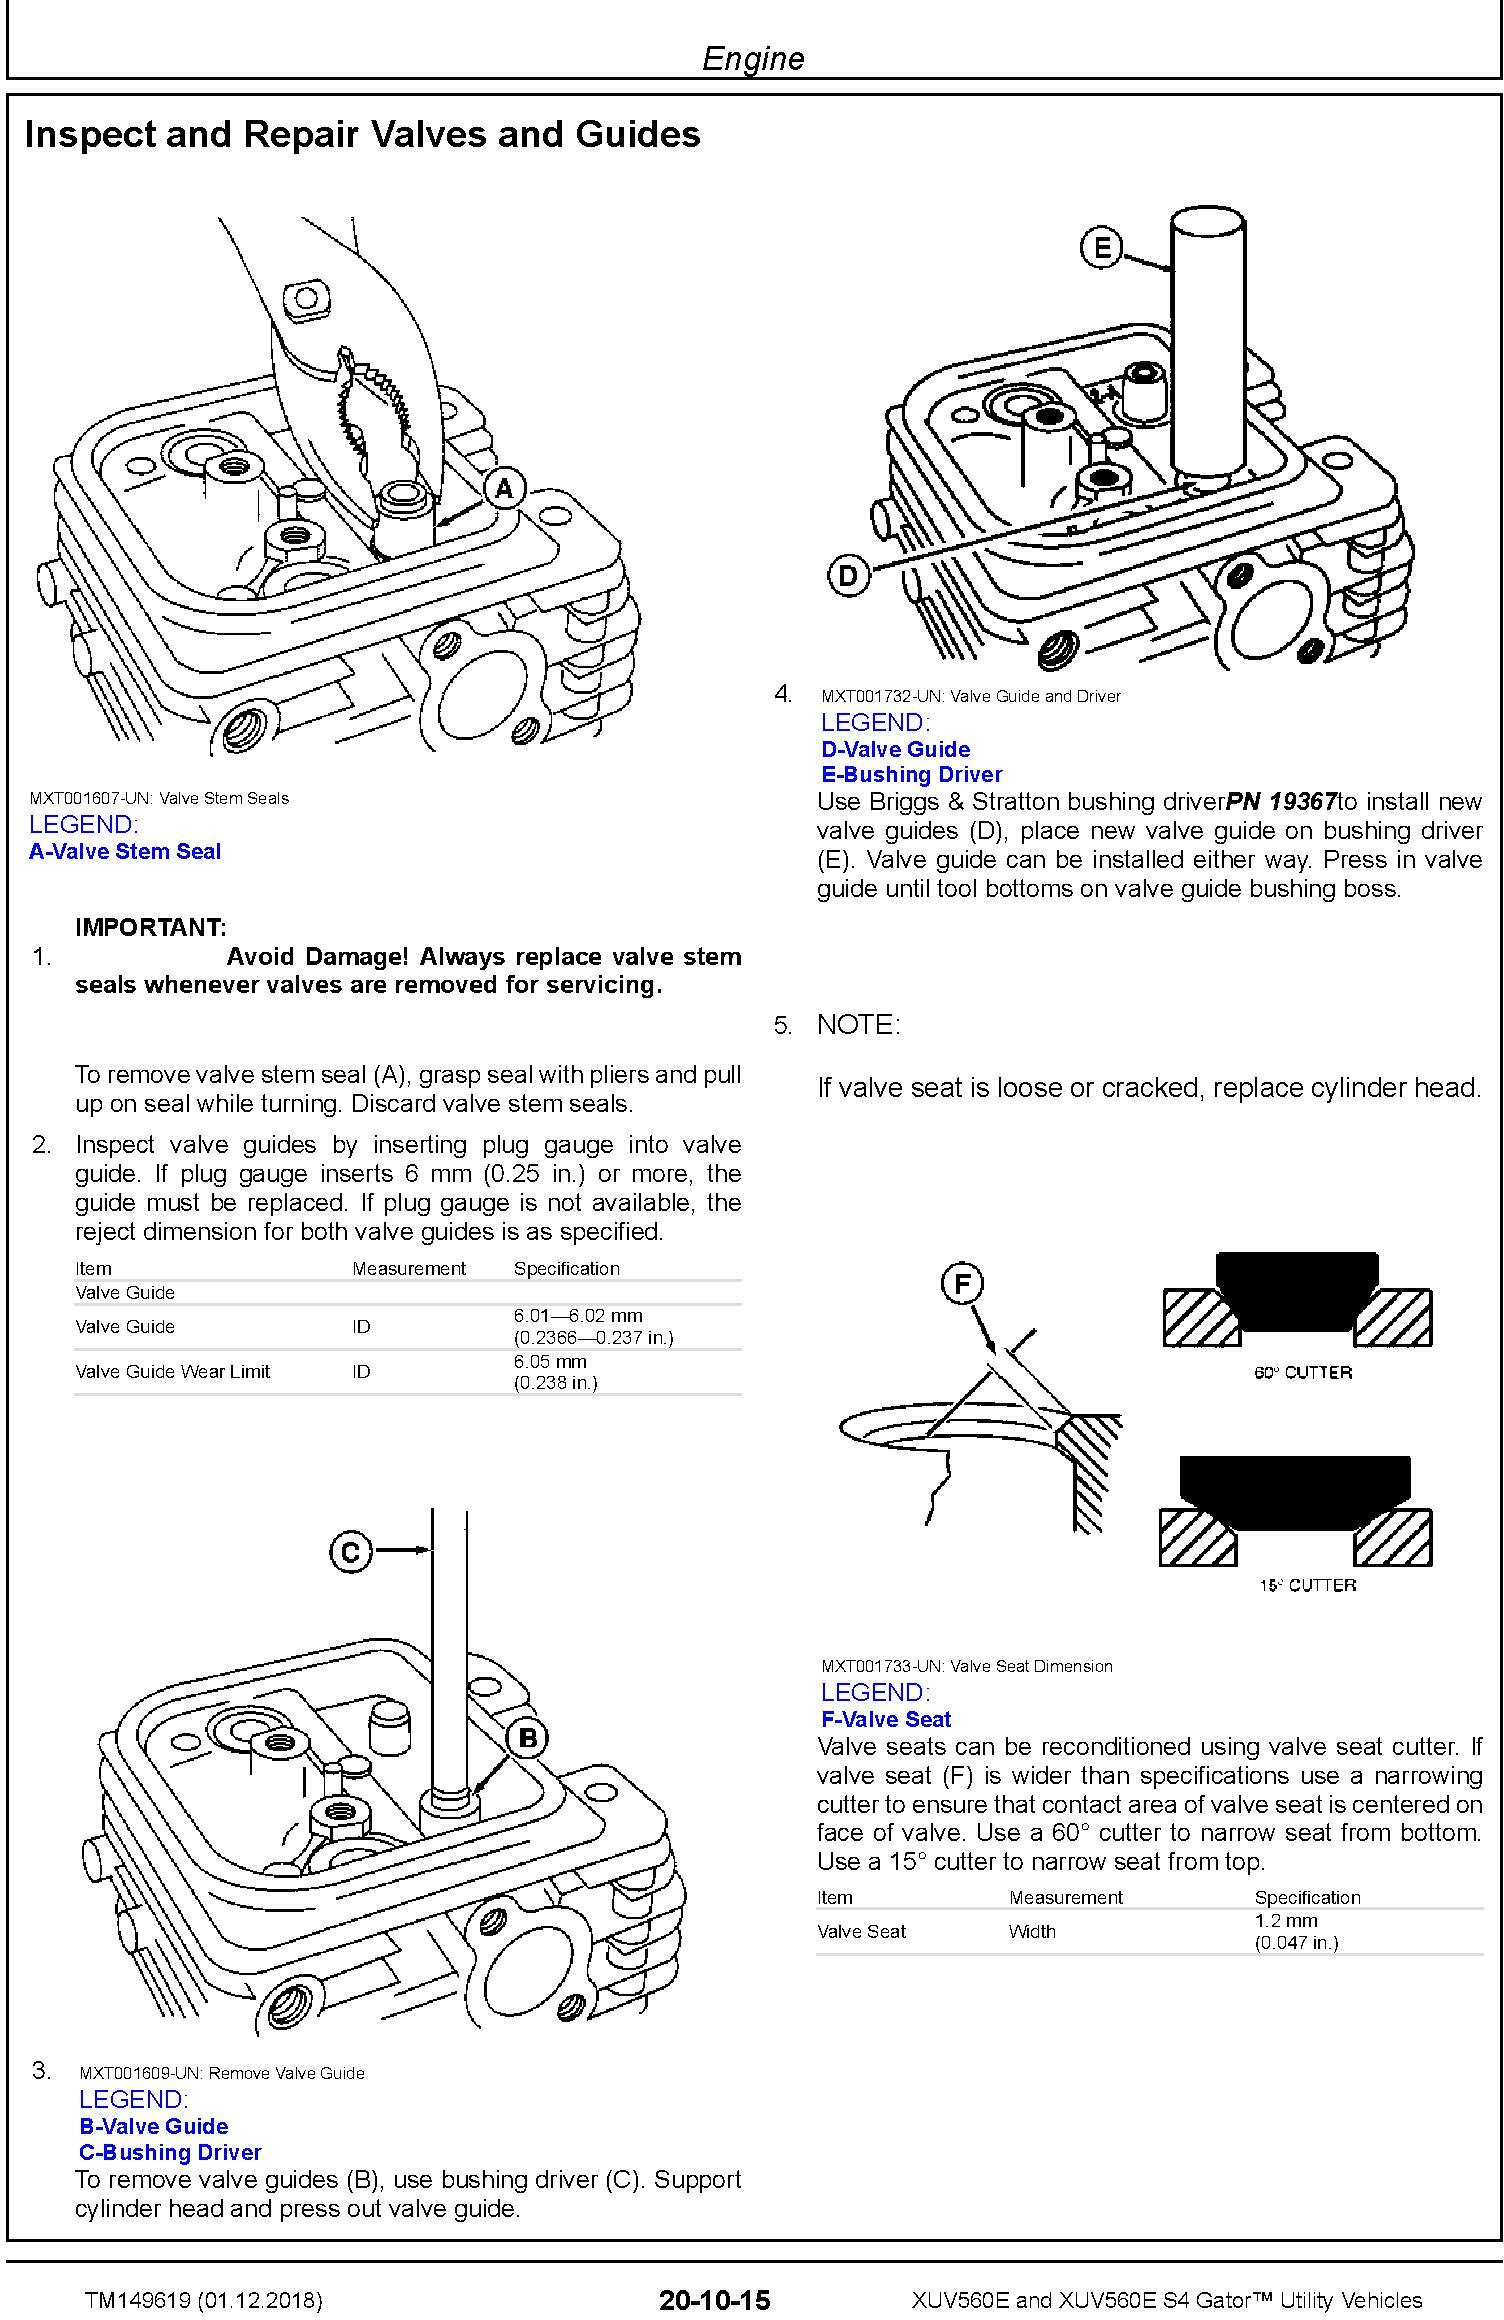 John Deere XUV560E and XUV560E S4 Gator Utility Vehicles (SN. 010001-) Technical Manual (TM149619) - 2